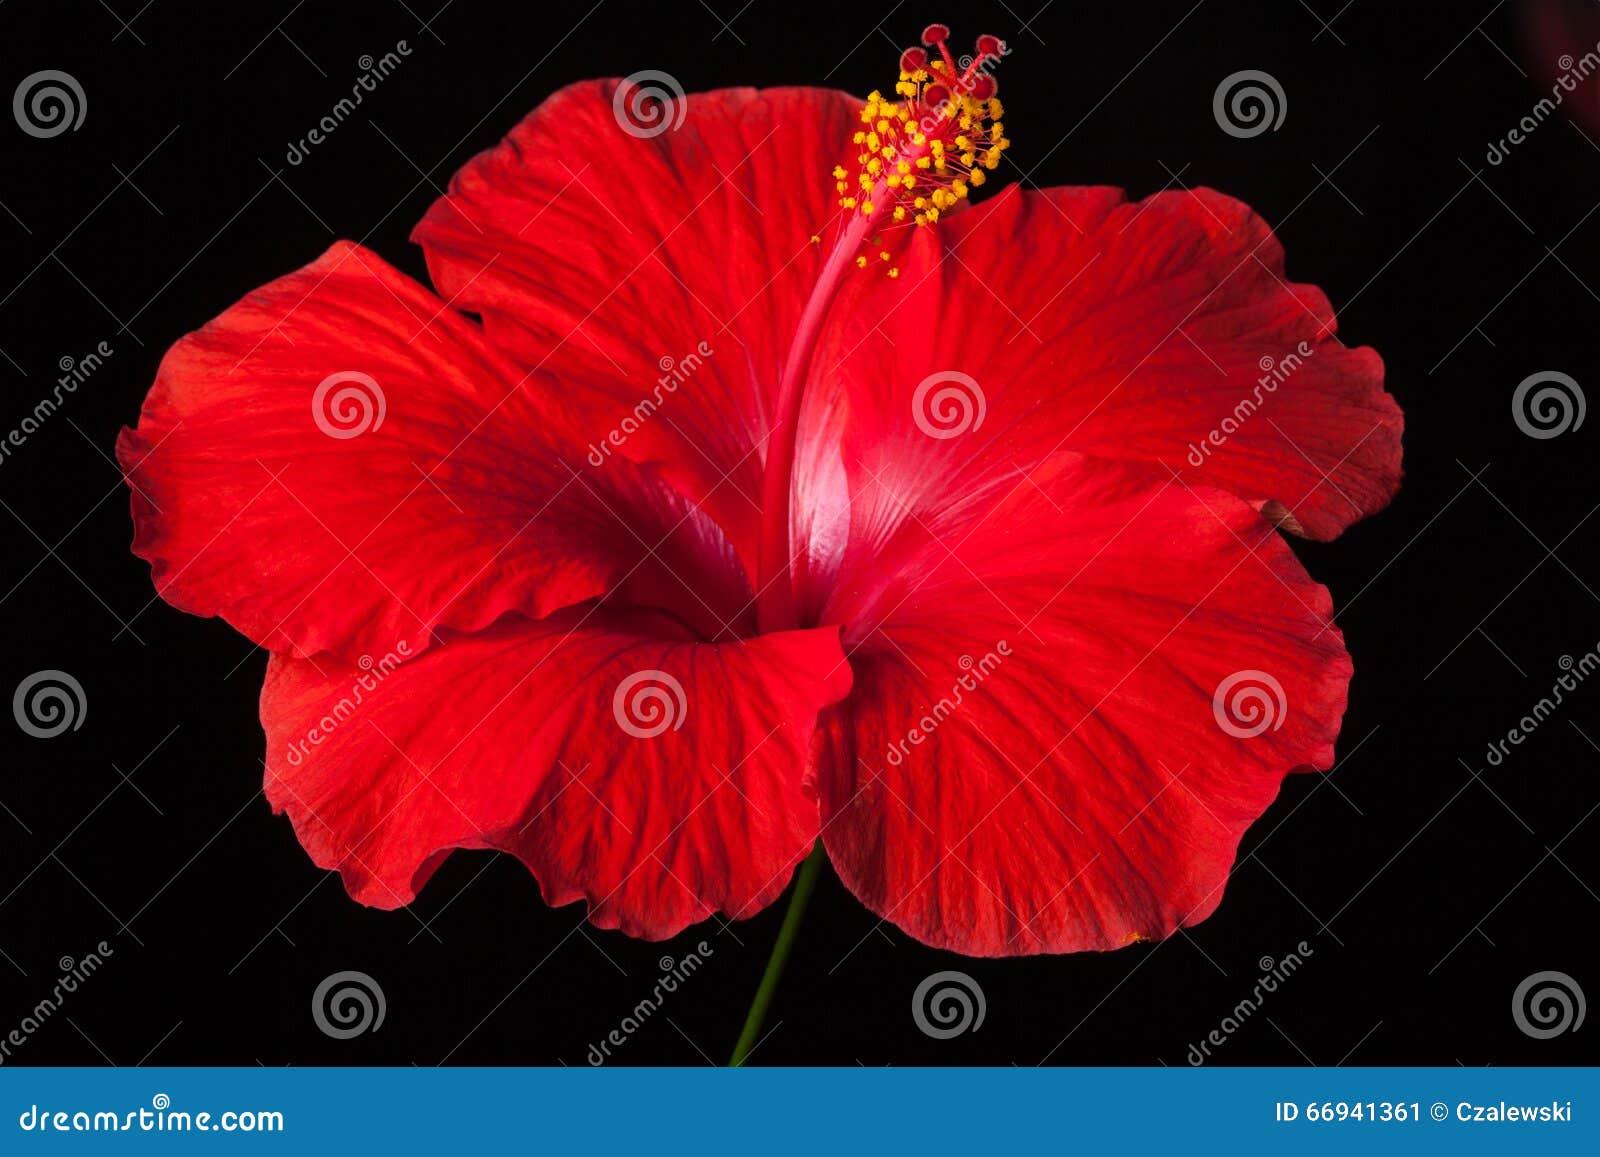 Red hibiscus flower on black background stock image image of red hibiscus flower on black background izmirmasajfo